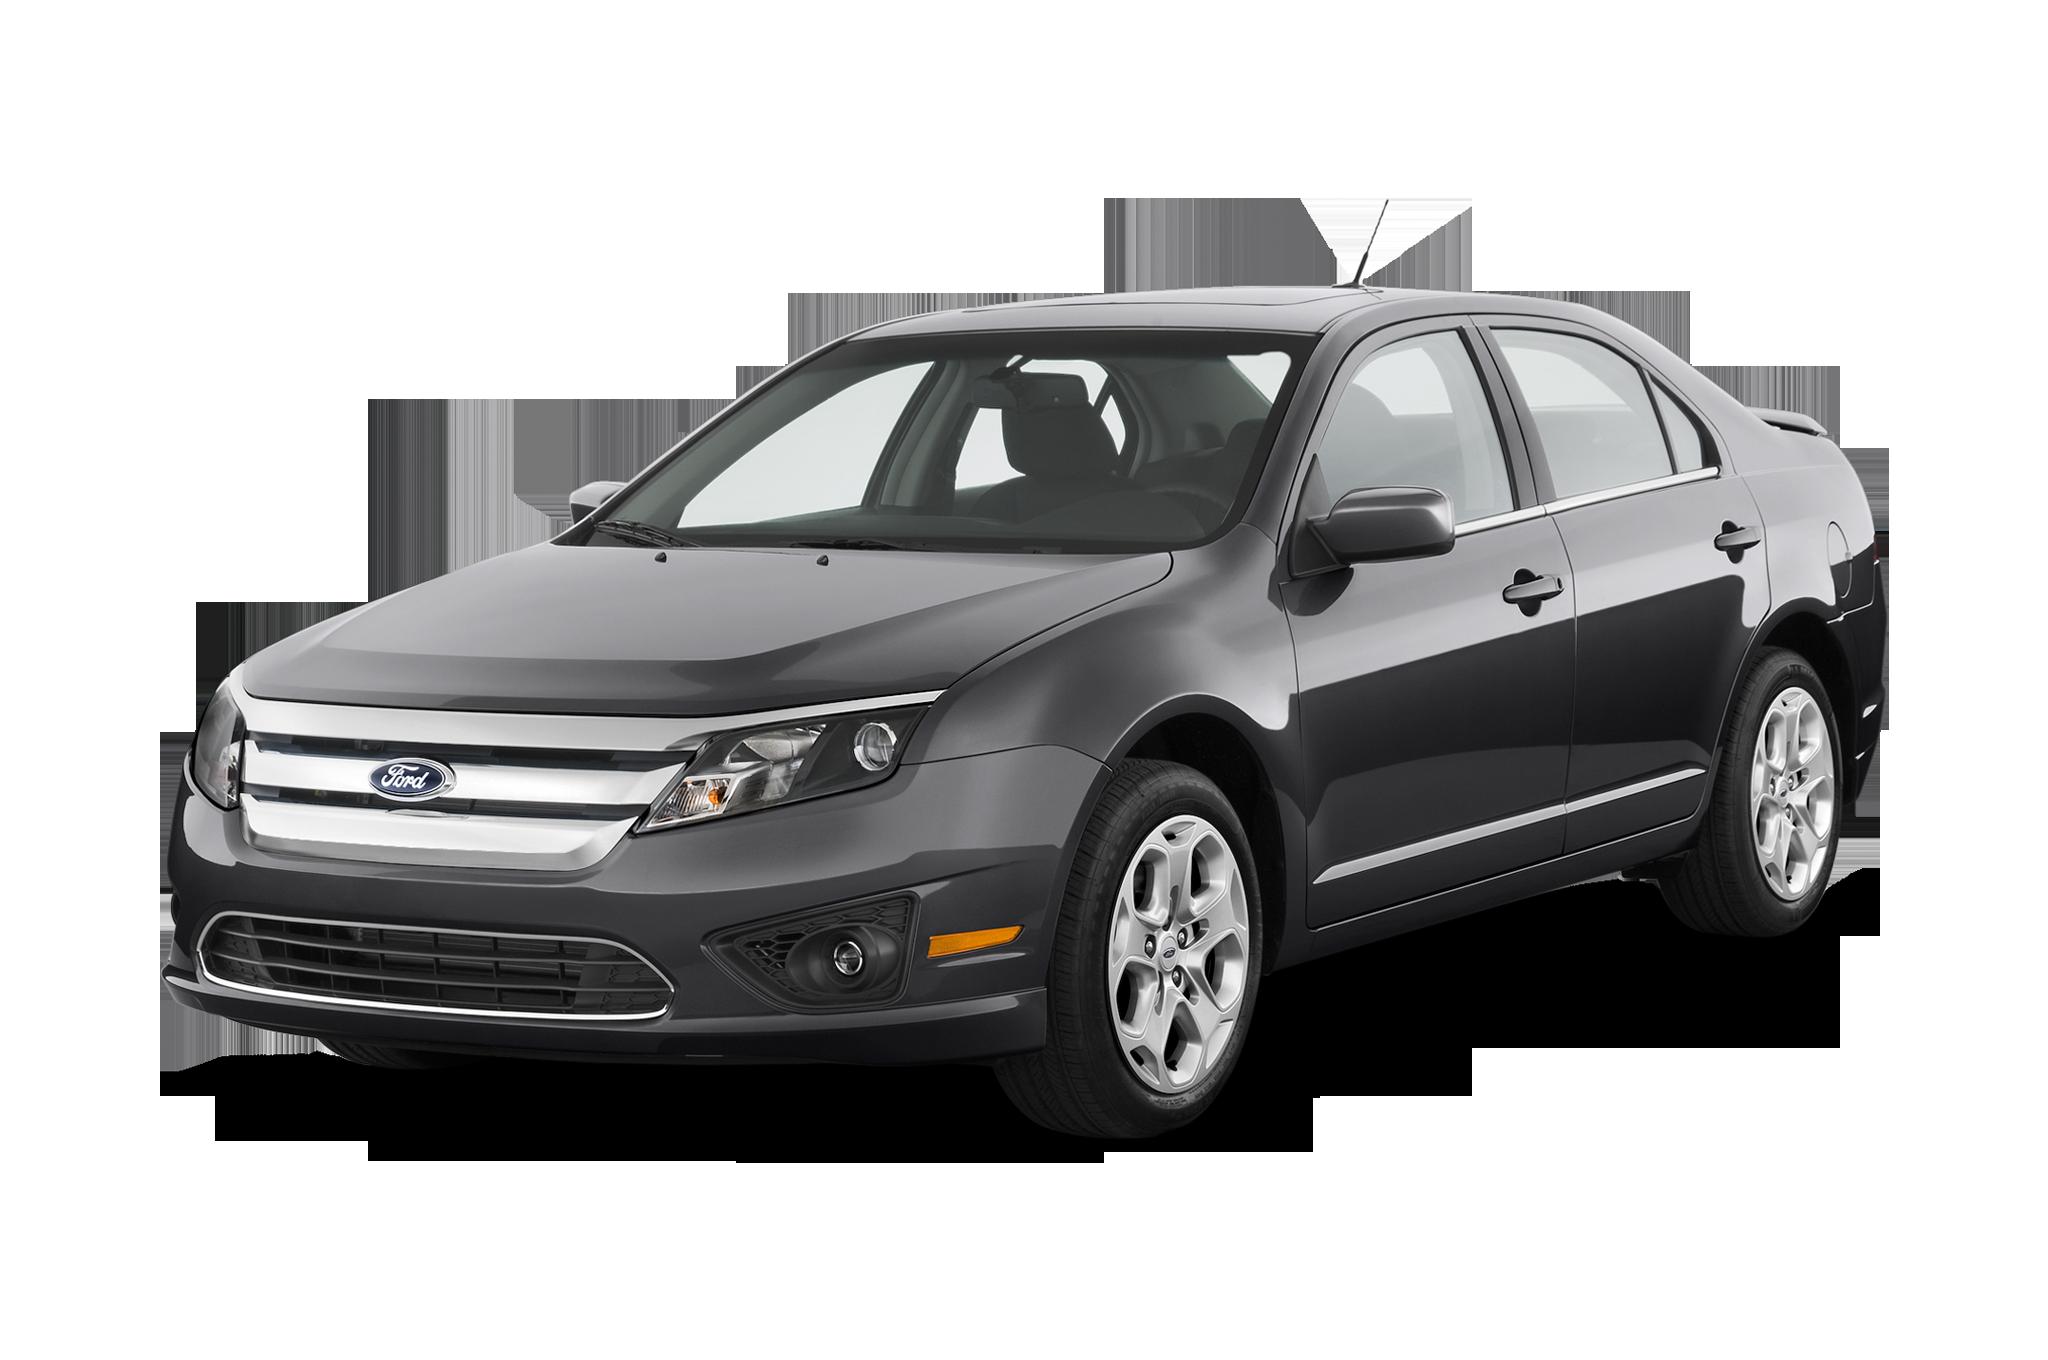 Ford Fusion (North America) I 2005 - 2012 Sedan #1